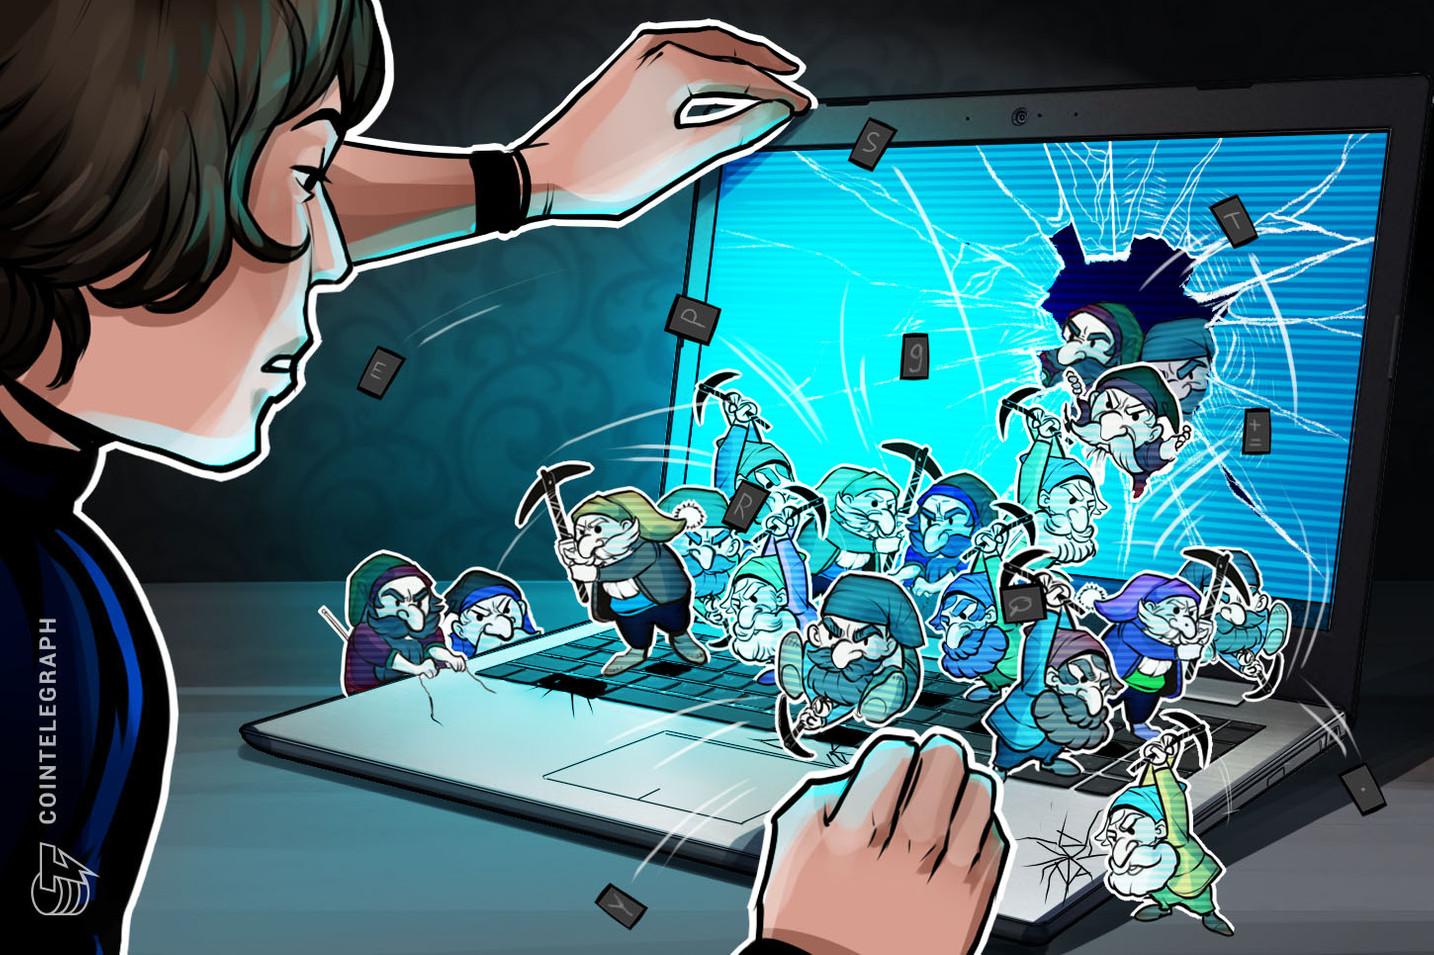 Kaspersky ranks cryptojackers among top malware threats in Africa